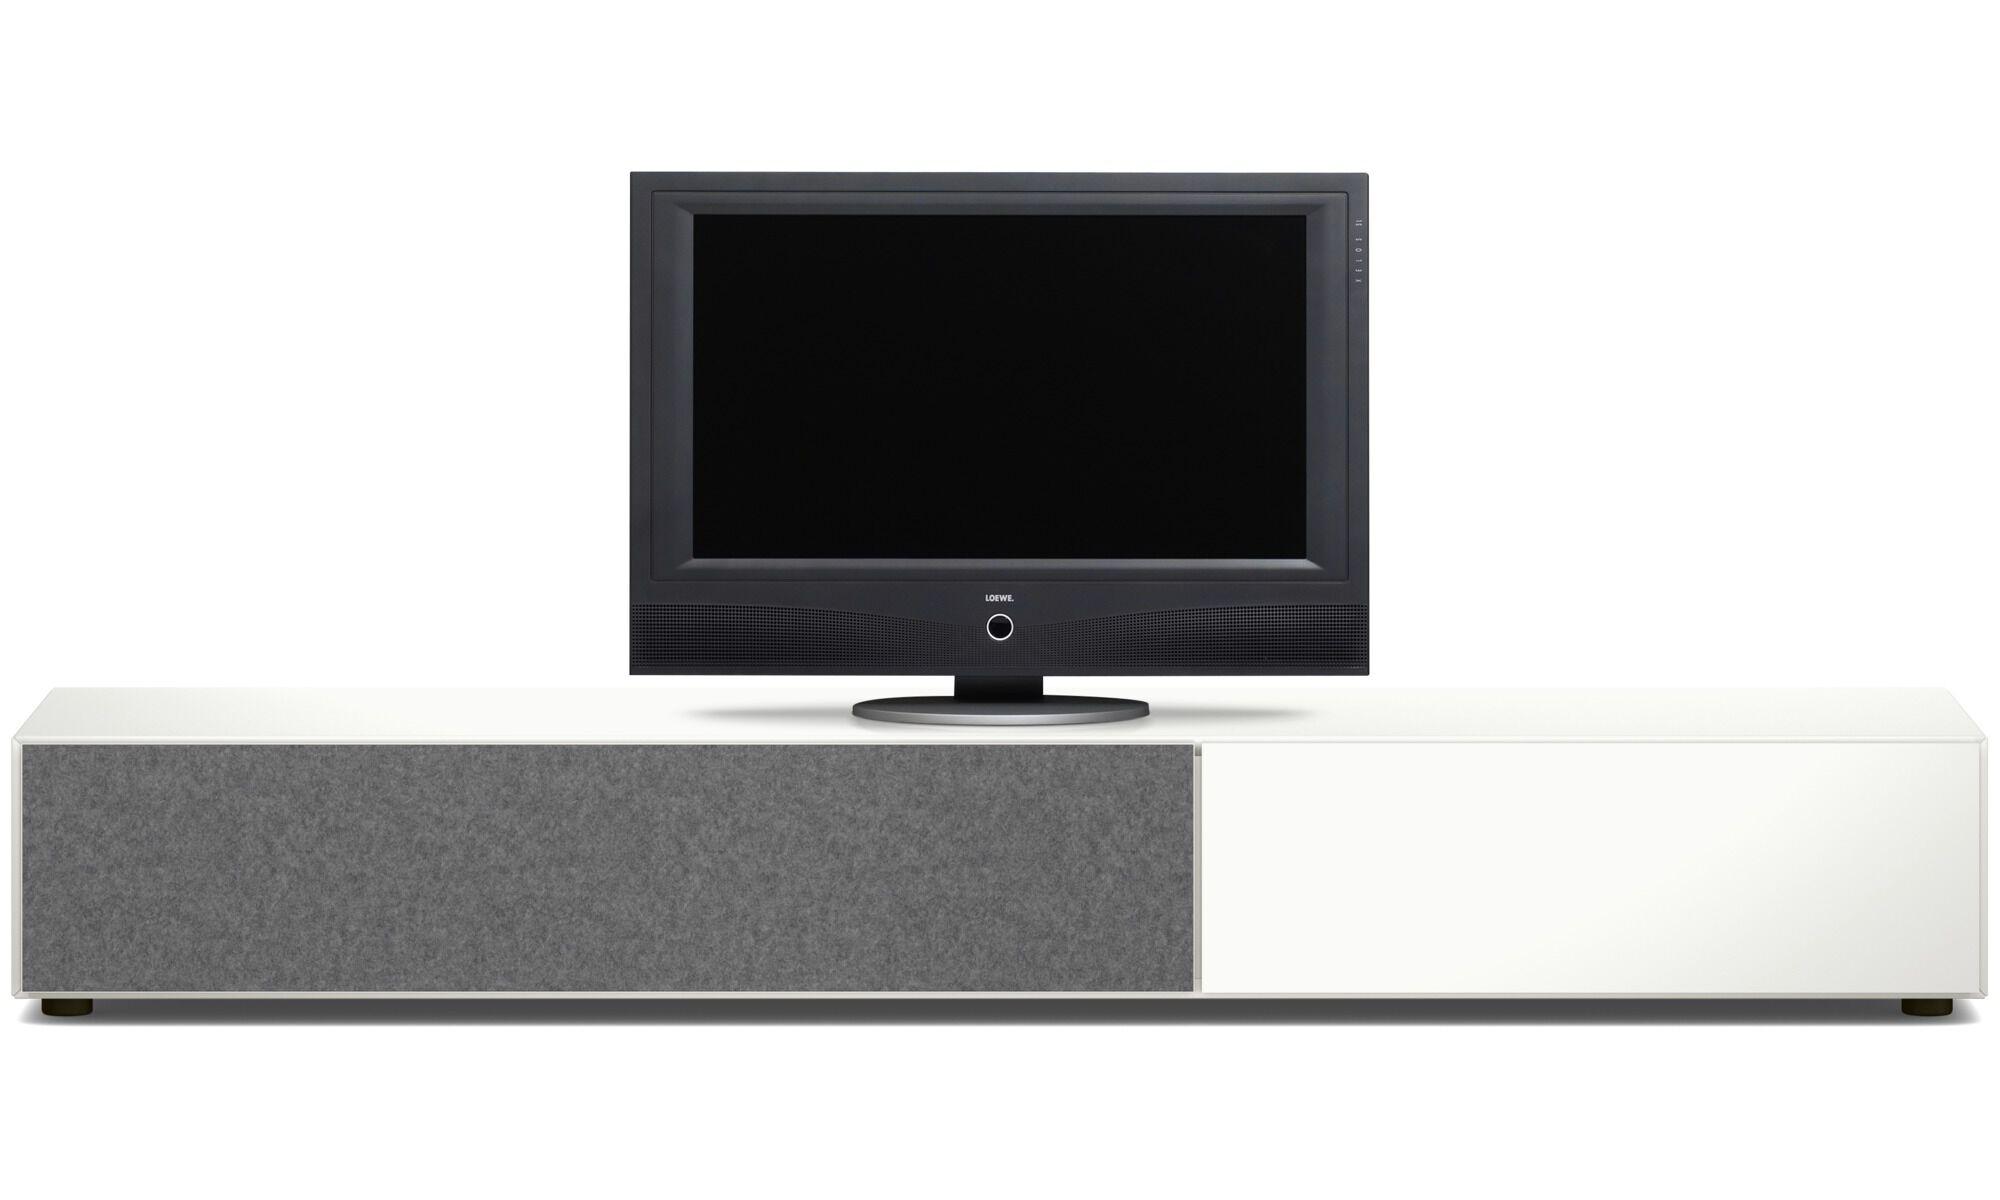 Tv Tisch Ecke ~ Tv tisch ecke sch ne tv tisch ecke dawnoo dezain tv rack f r